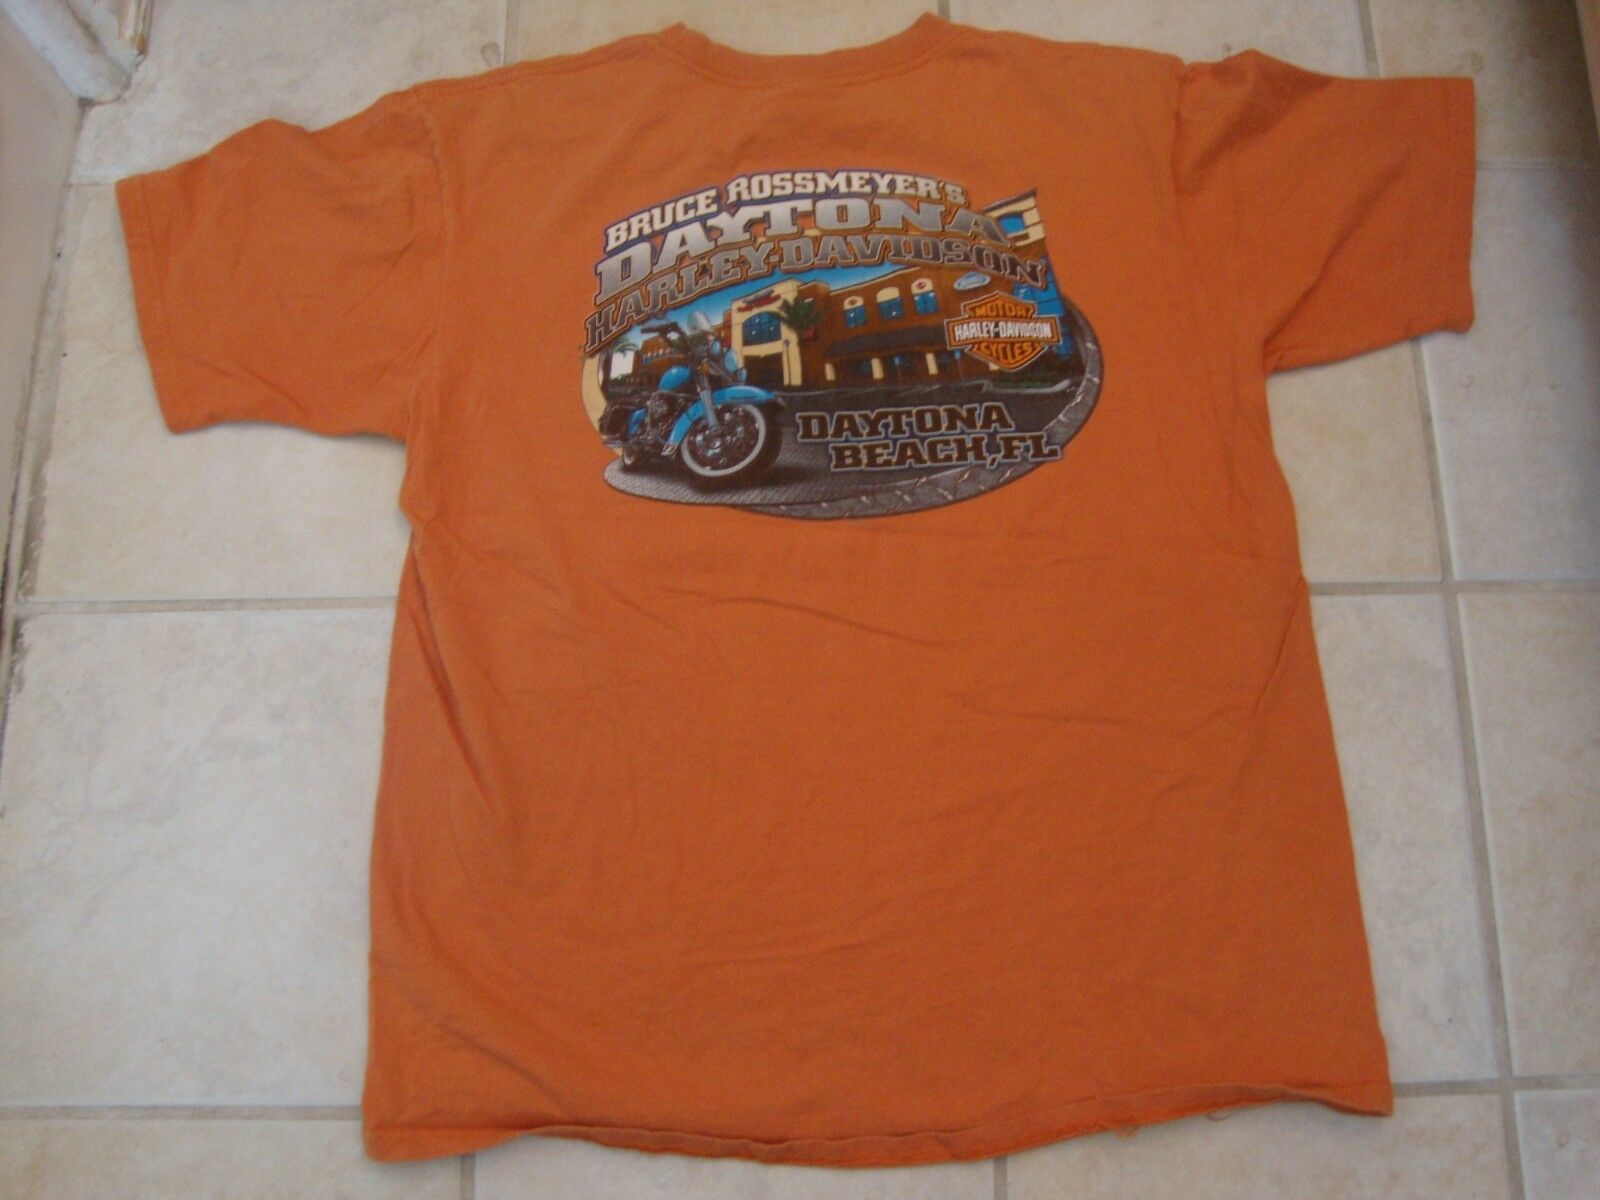 Harley-Davidson Motorcycles Daytona Beach, Florida t shirt Size XL  image 2